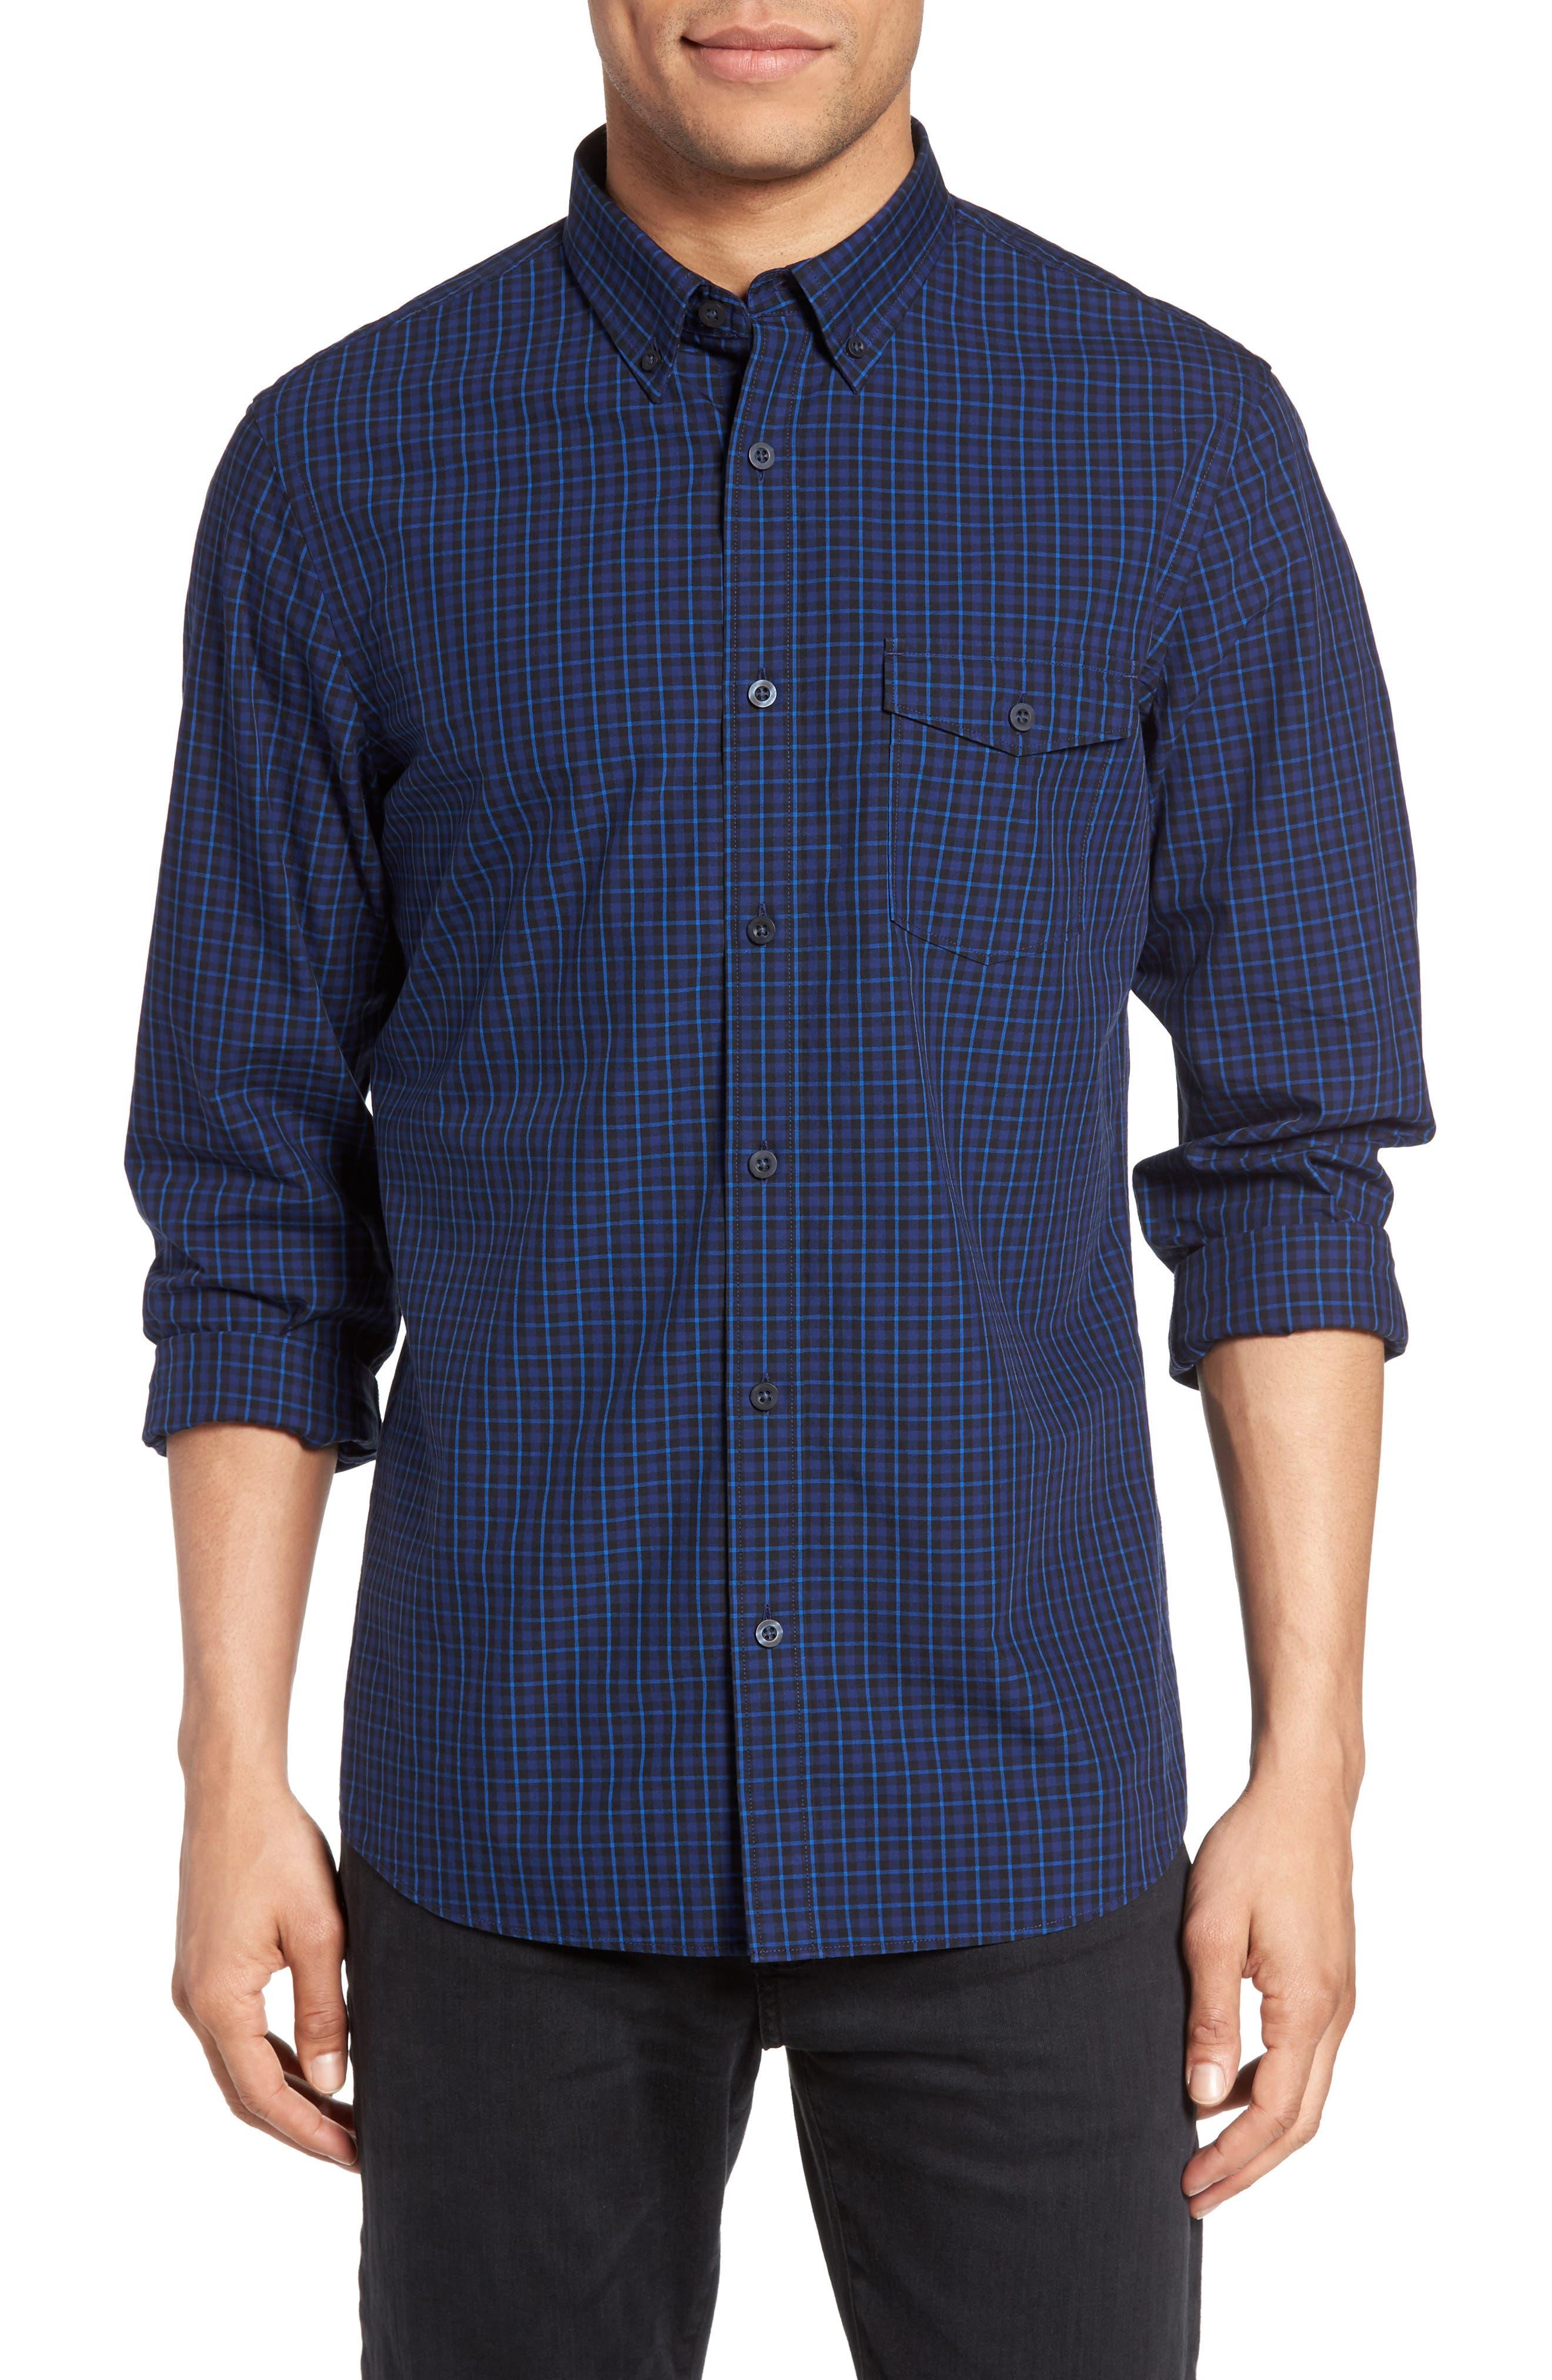 Main Image - Nordstrom Men's Shop Slim Fit Plaid Sport Shirt (Regular & Tall)